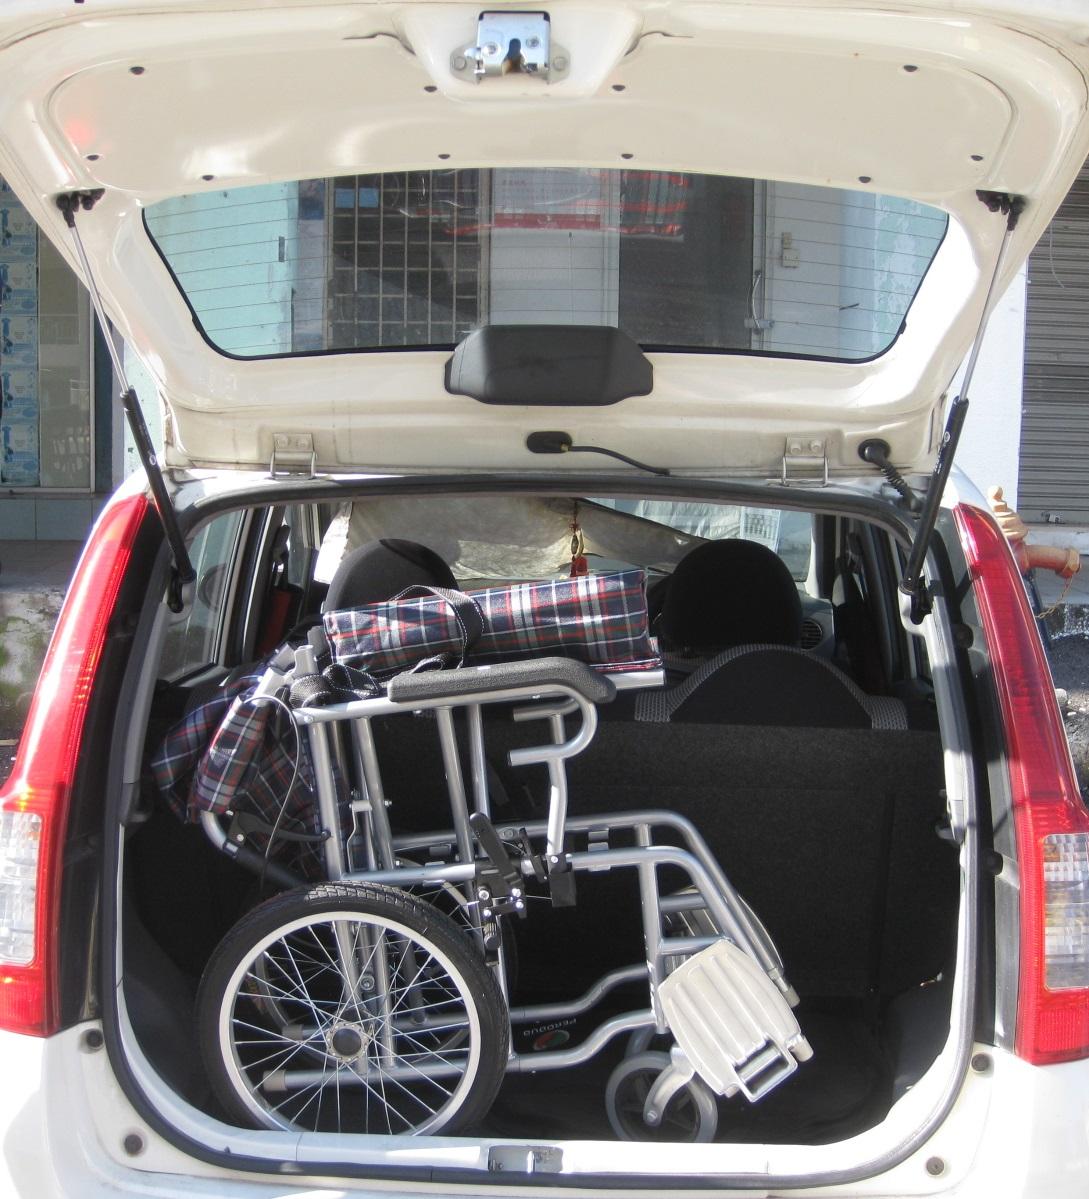 swing chair mudah adirondack patterns kerusi roda melancong ringan si end 1 8 2017 9 15 am